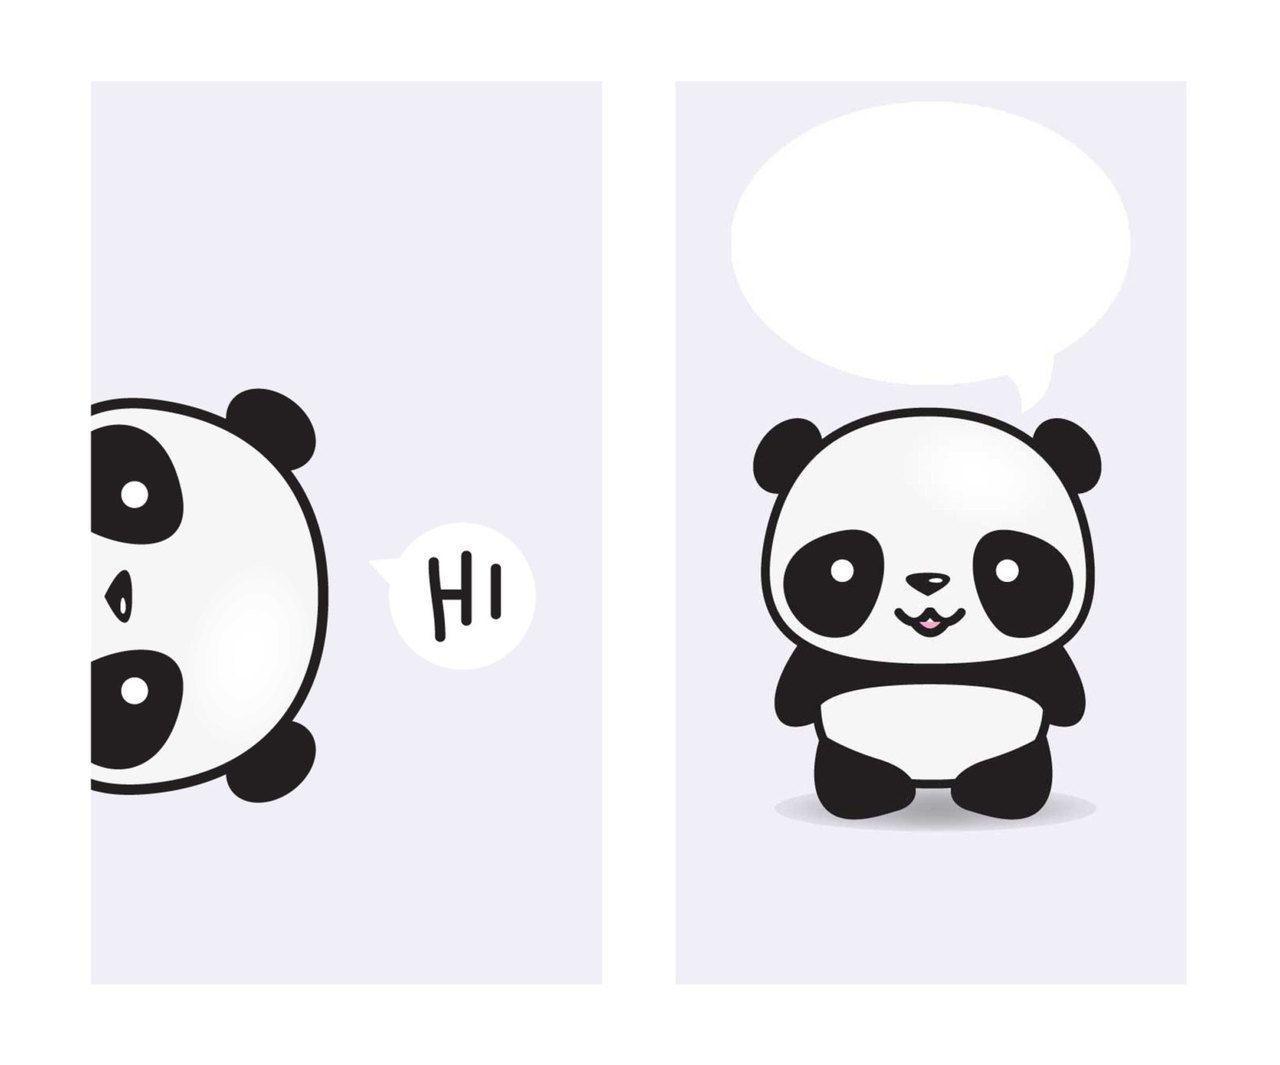 Kawaii Anime Panda Wallpapers Top Free Kawaii Anime Panda